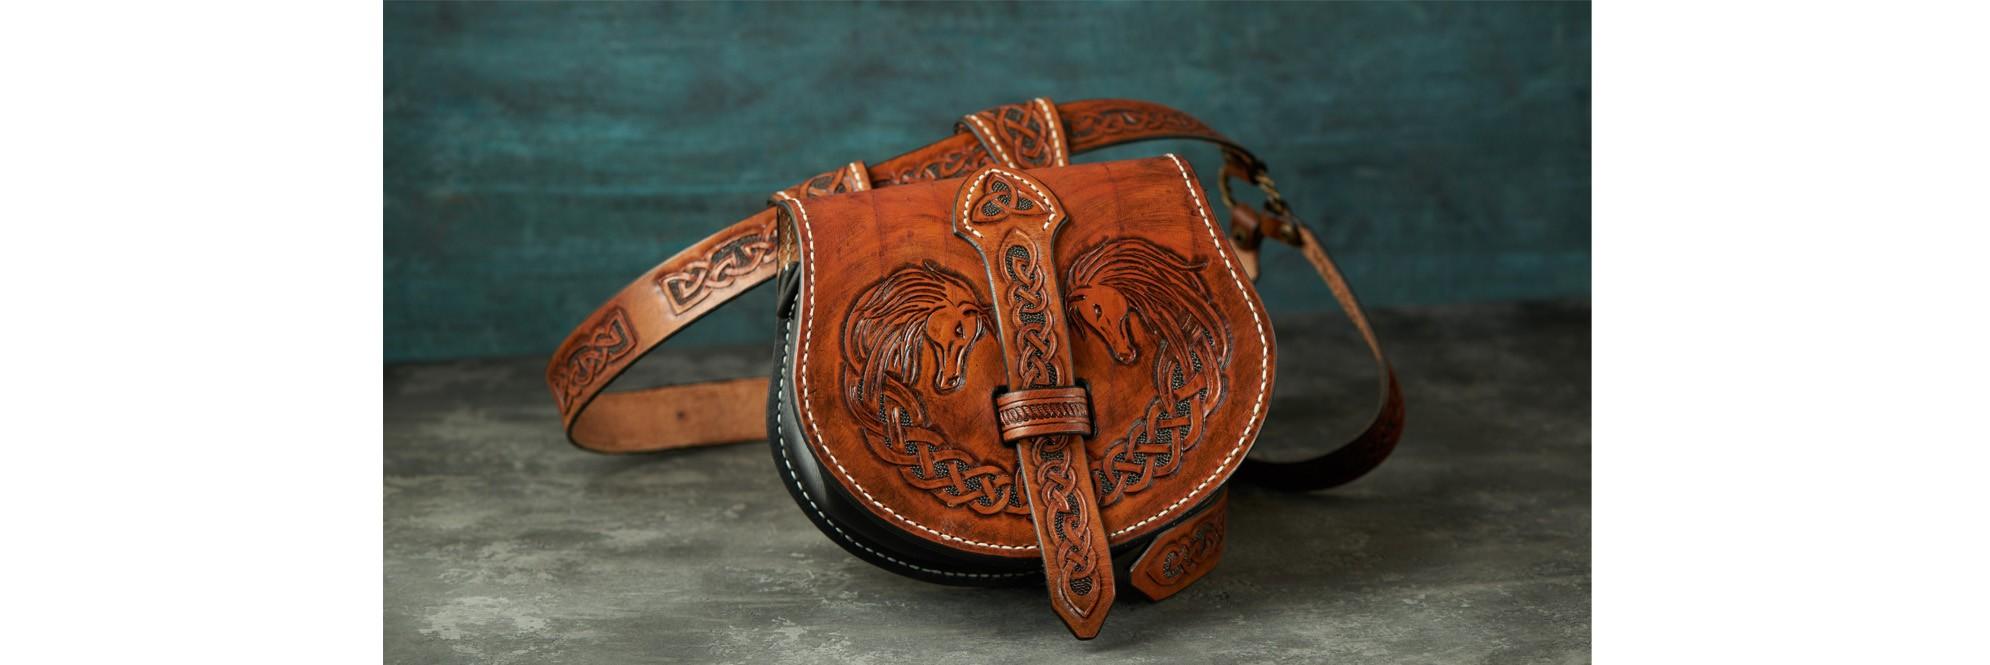 Leather Handmade Embossed Bags